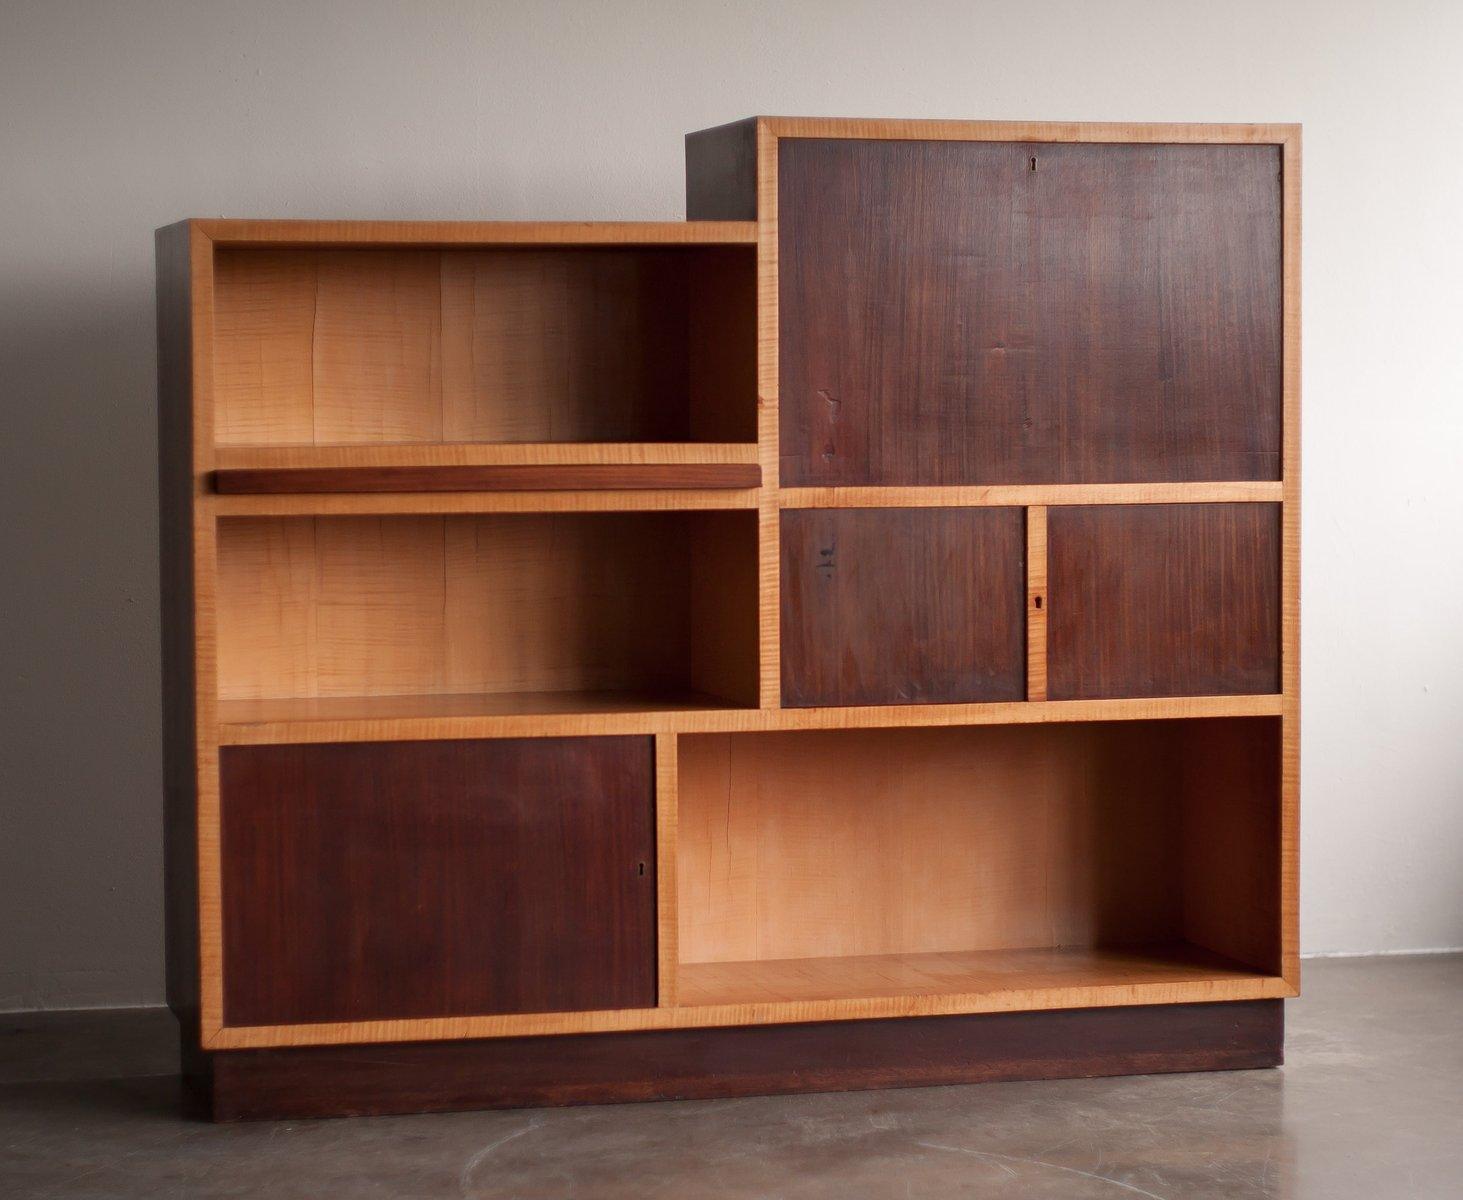 niederl ndischer modernistischer vintage schrank 1930er. Black Bedroom Furniture Sets. Home Design Ideas